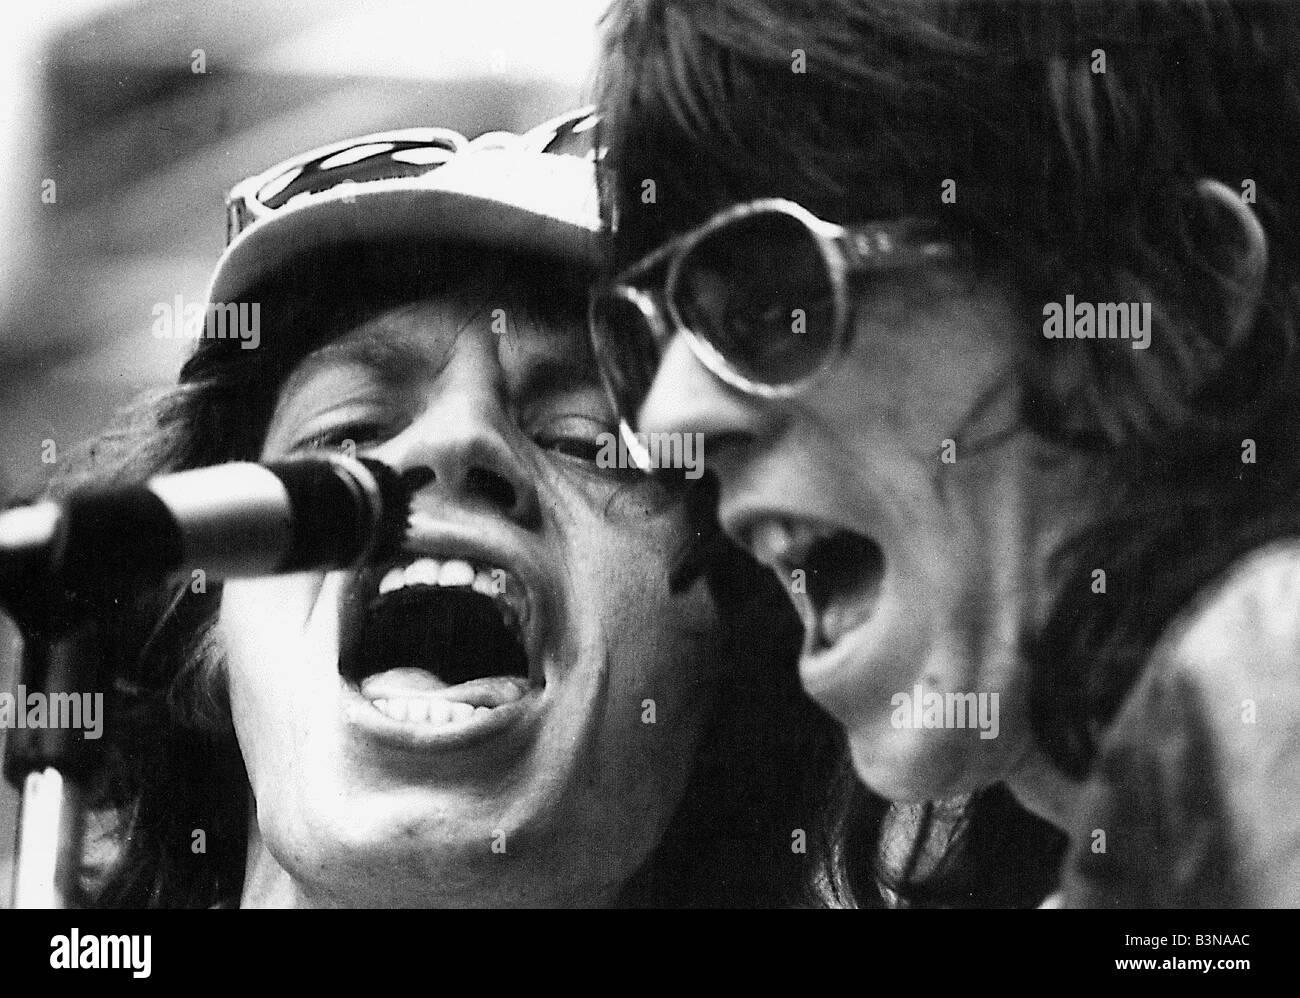 ROLLING STONES Mick Jagger und Keith Richards ca. 1980 Stockbild